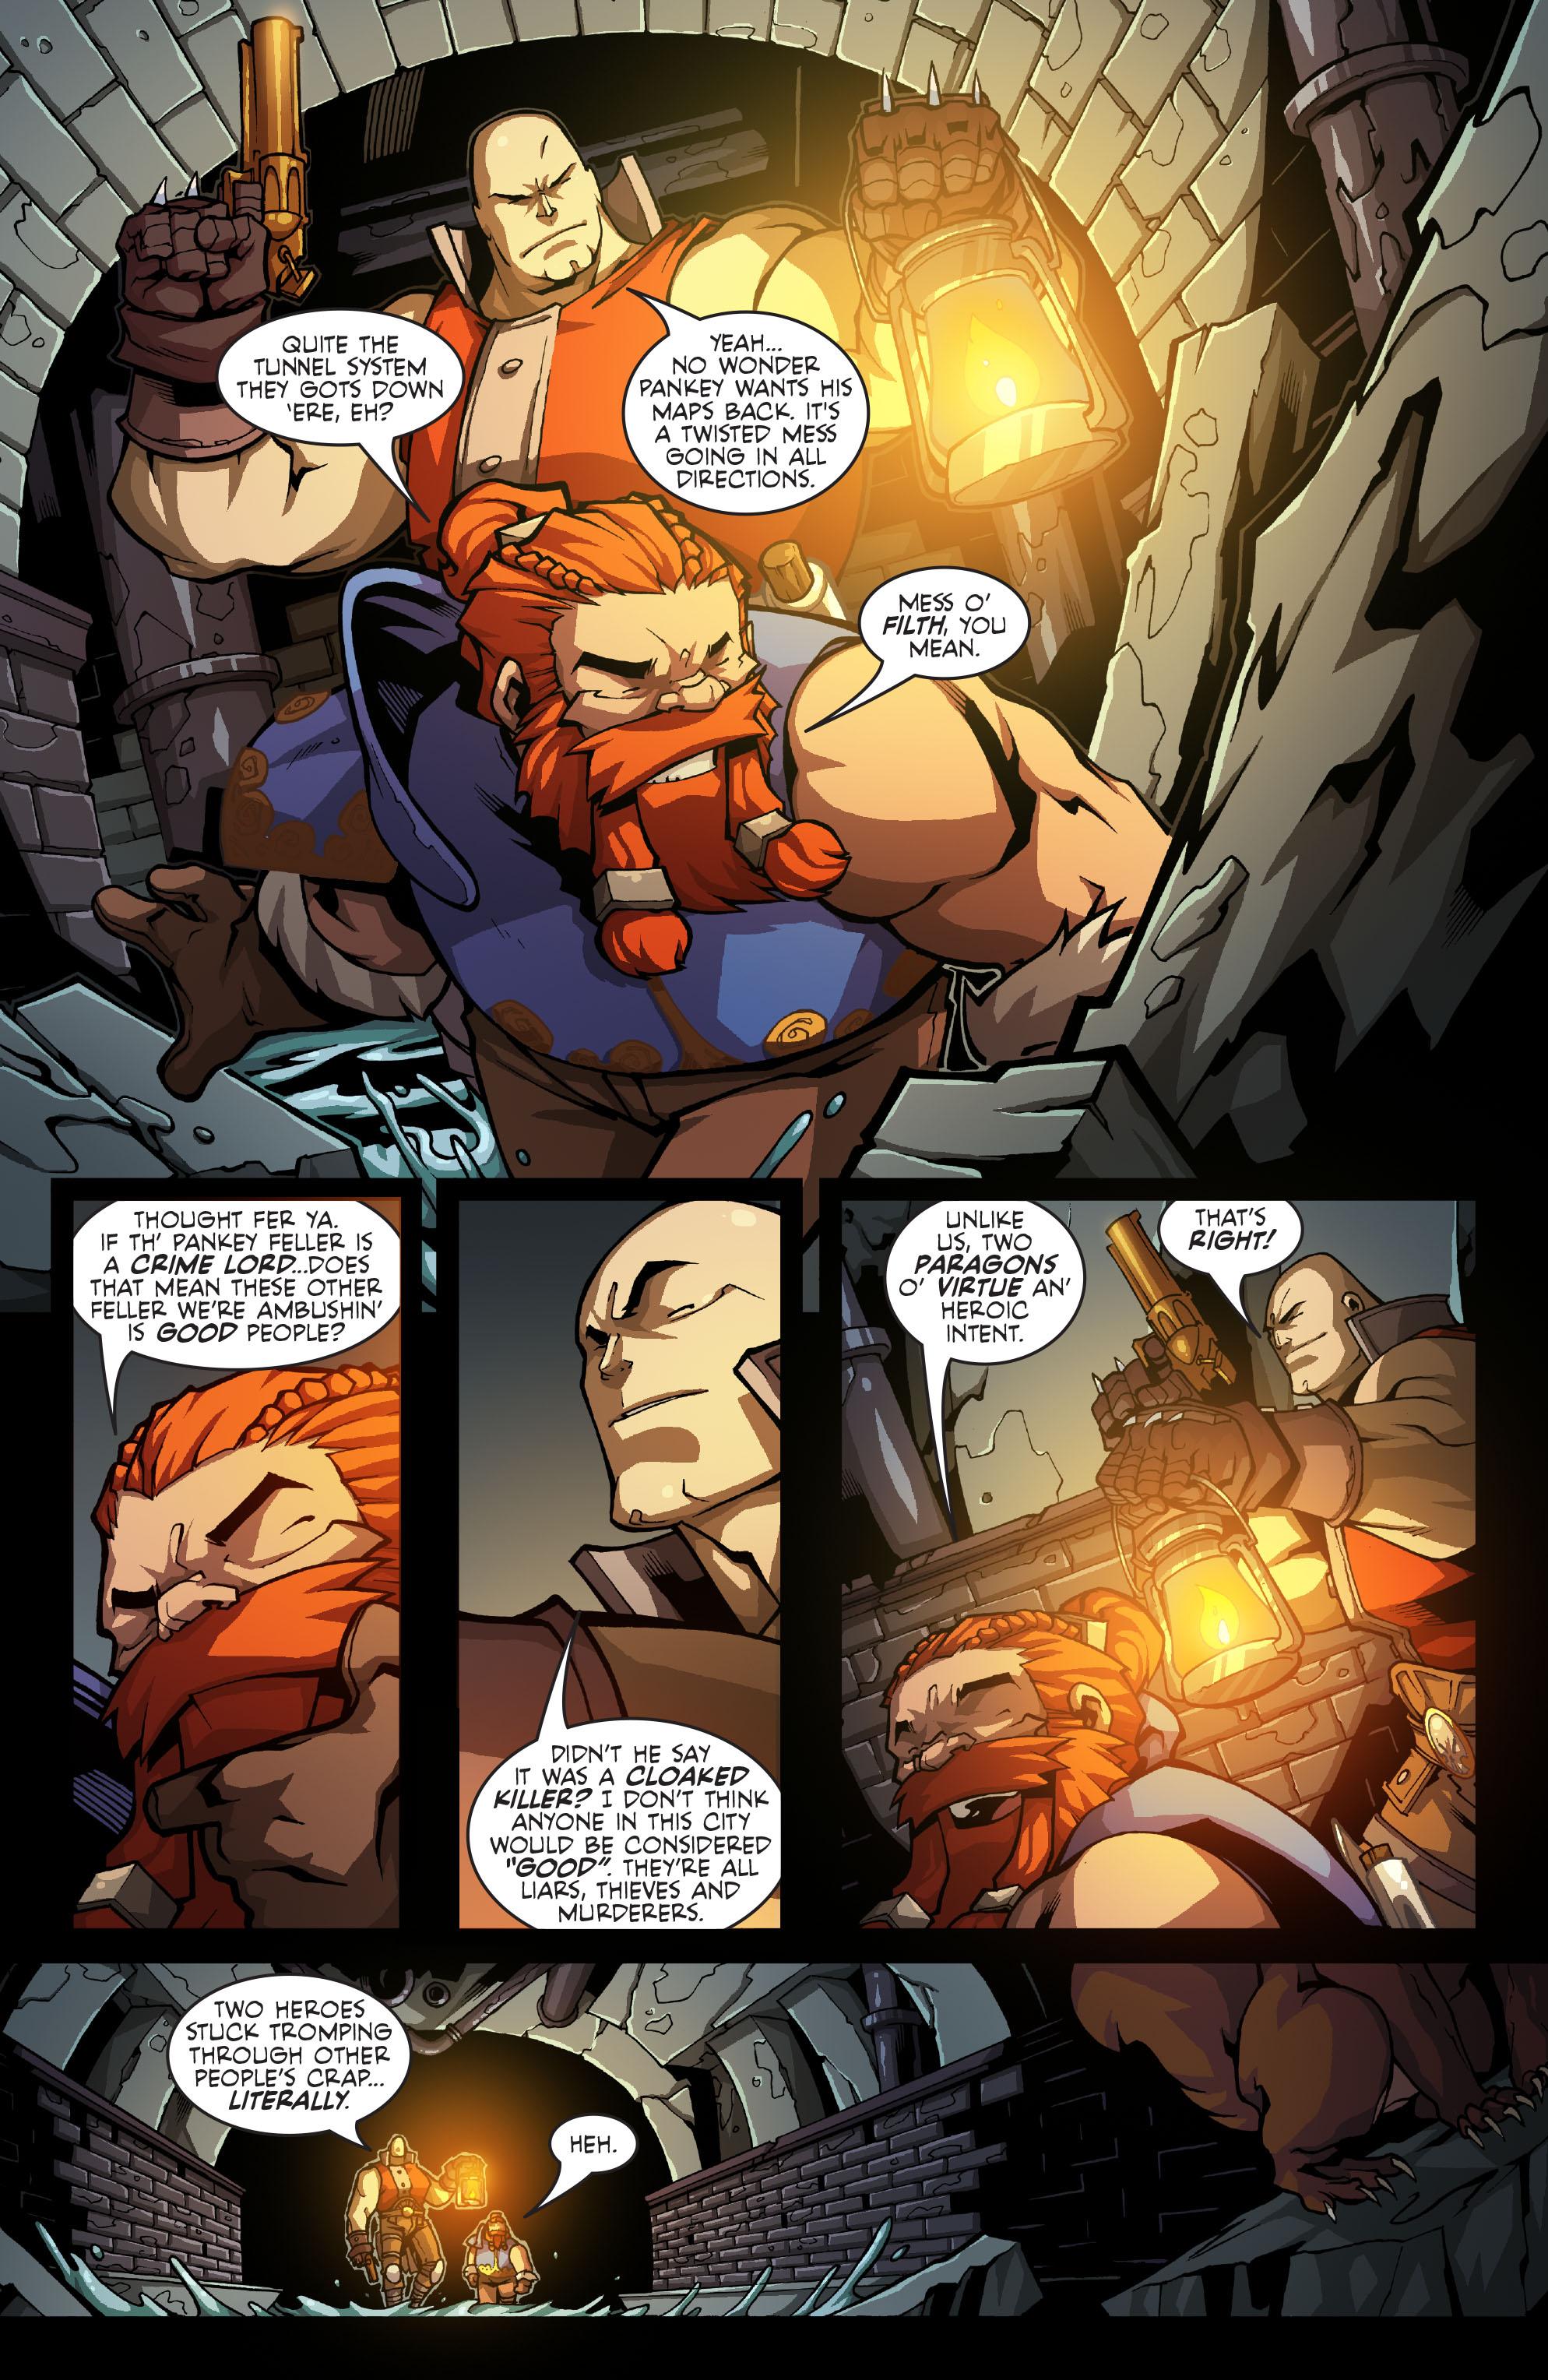 Read online Skullkickers comic -  Issue #9 - 15